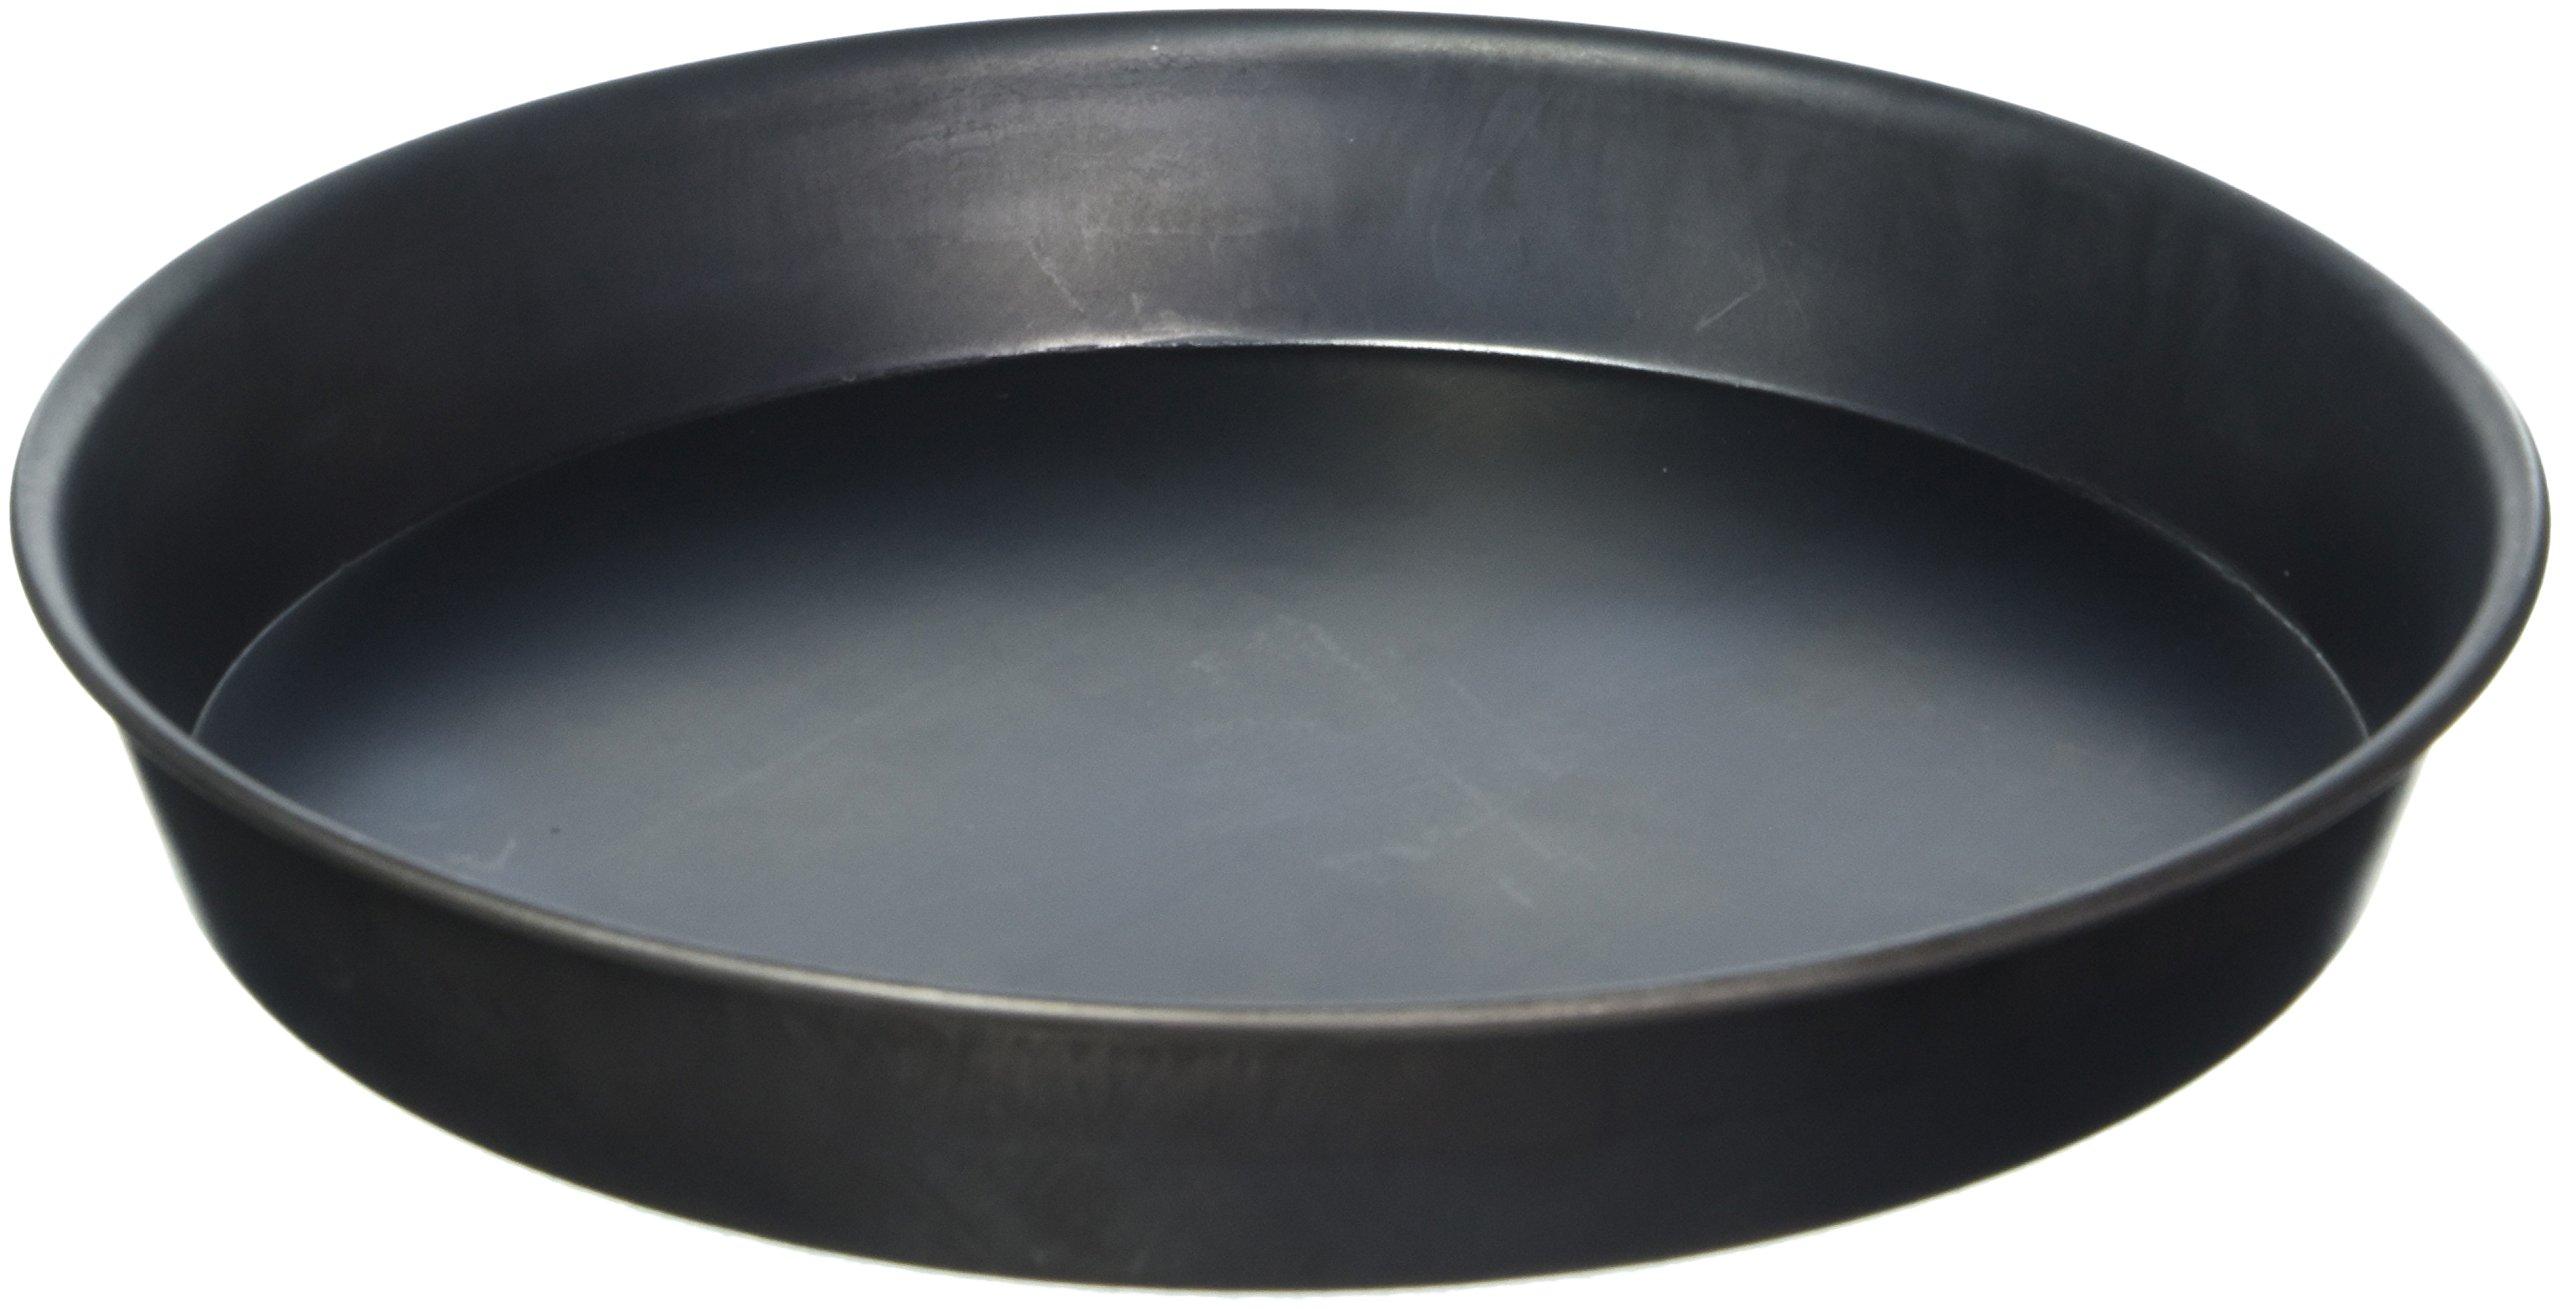 Ottinetti Blue Steel Deep Round Baking Pan, 26cm/10.2'', Gray